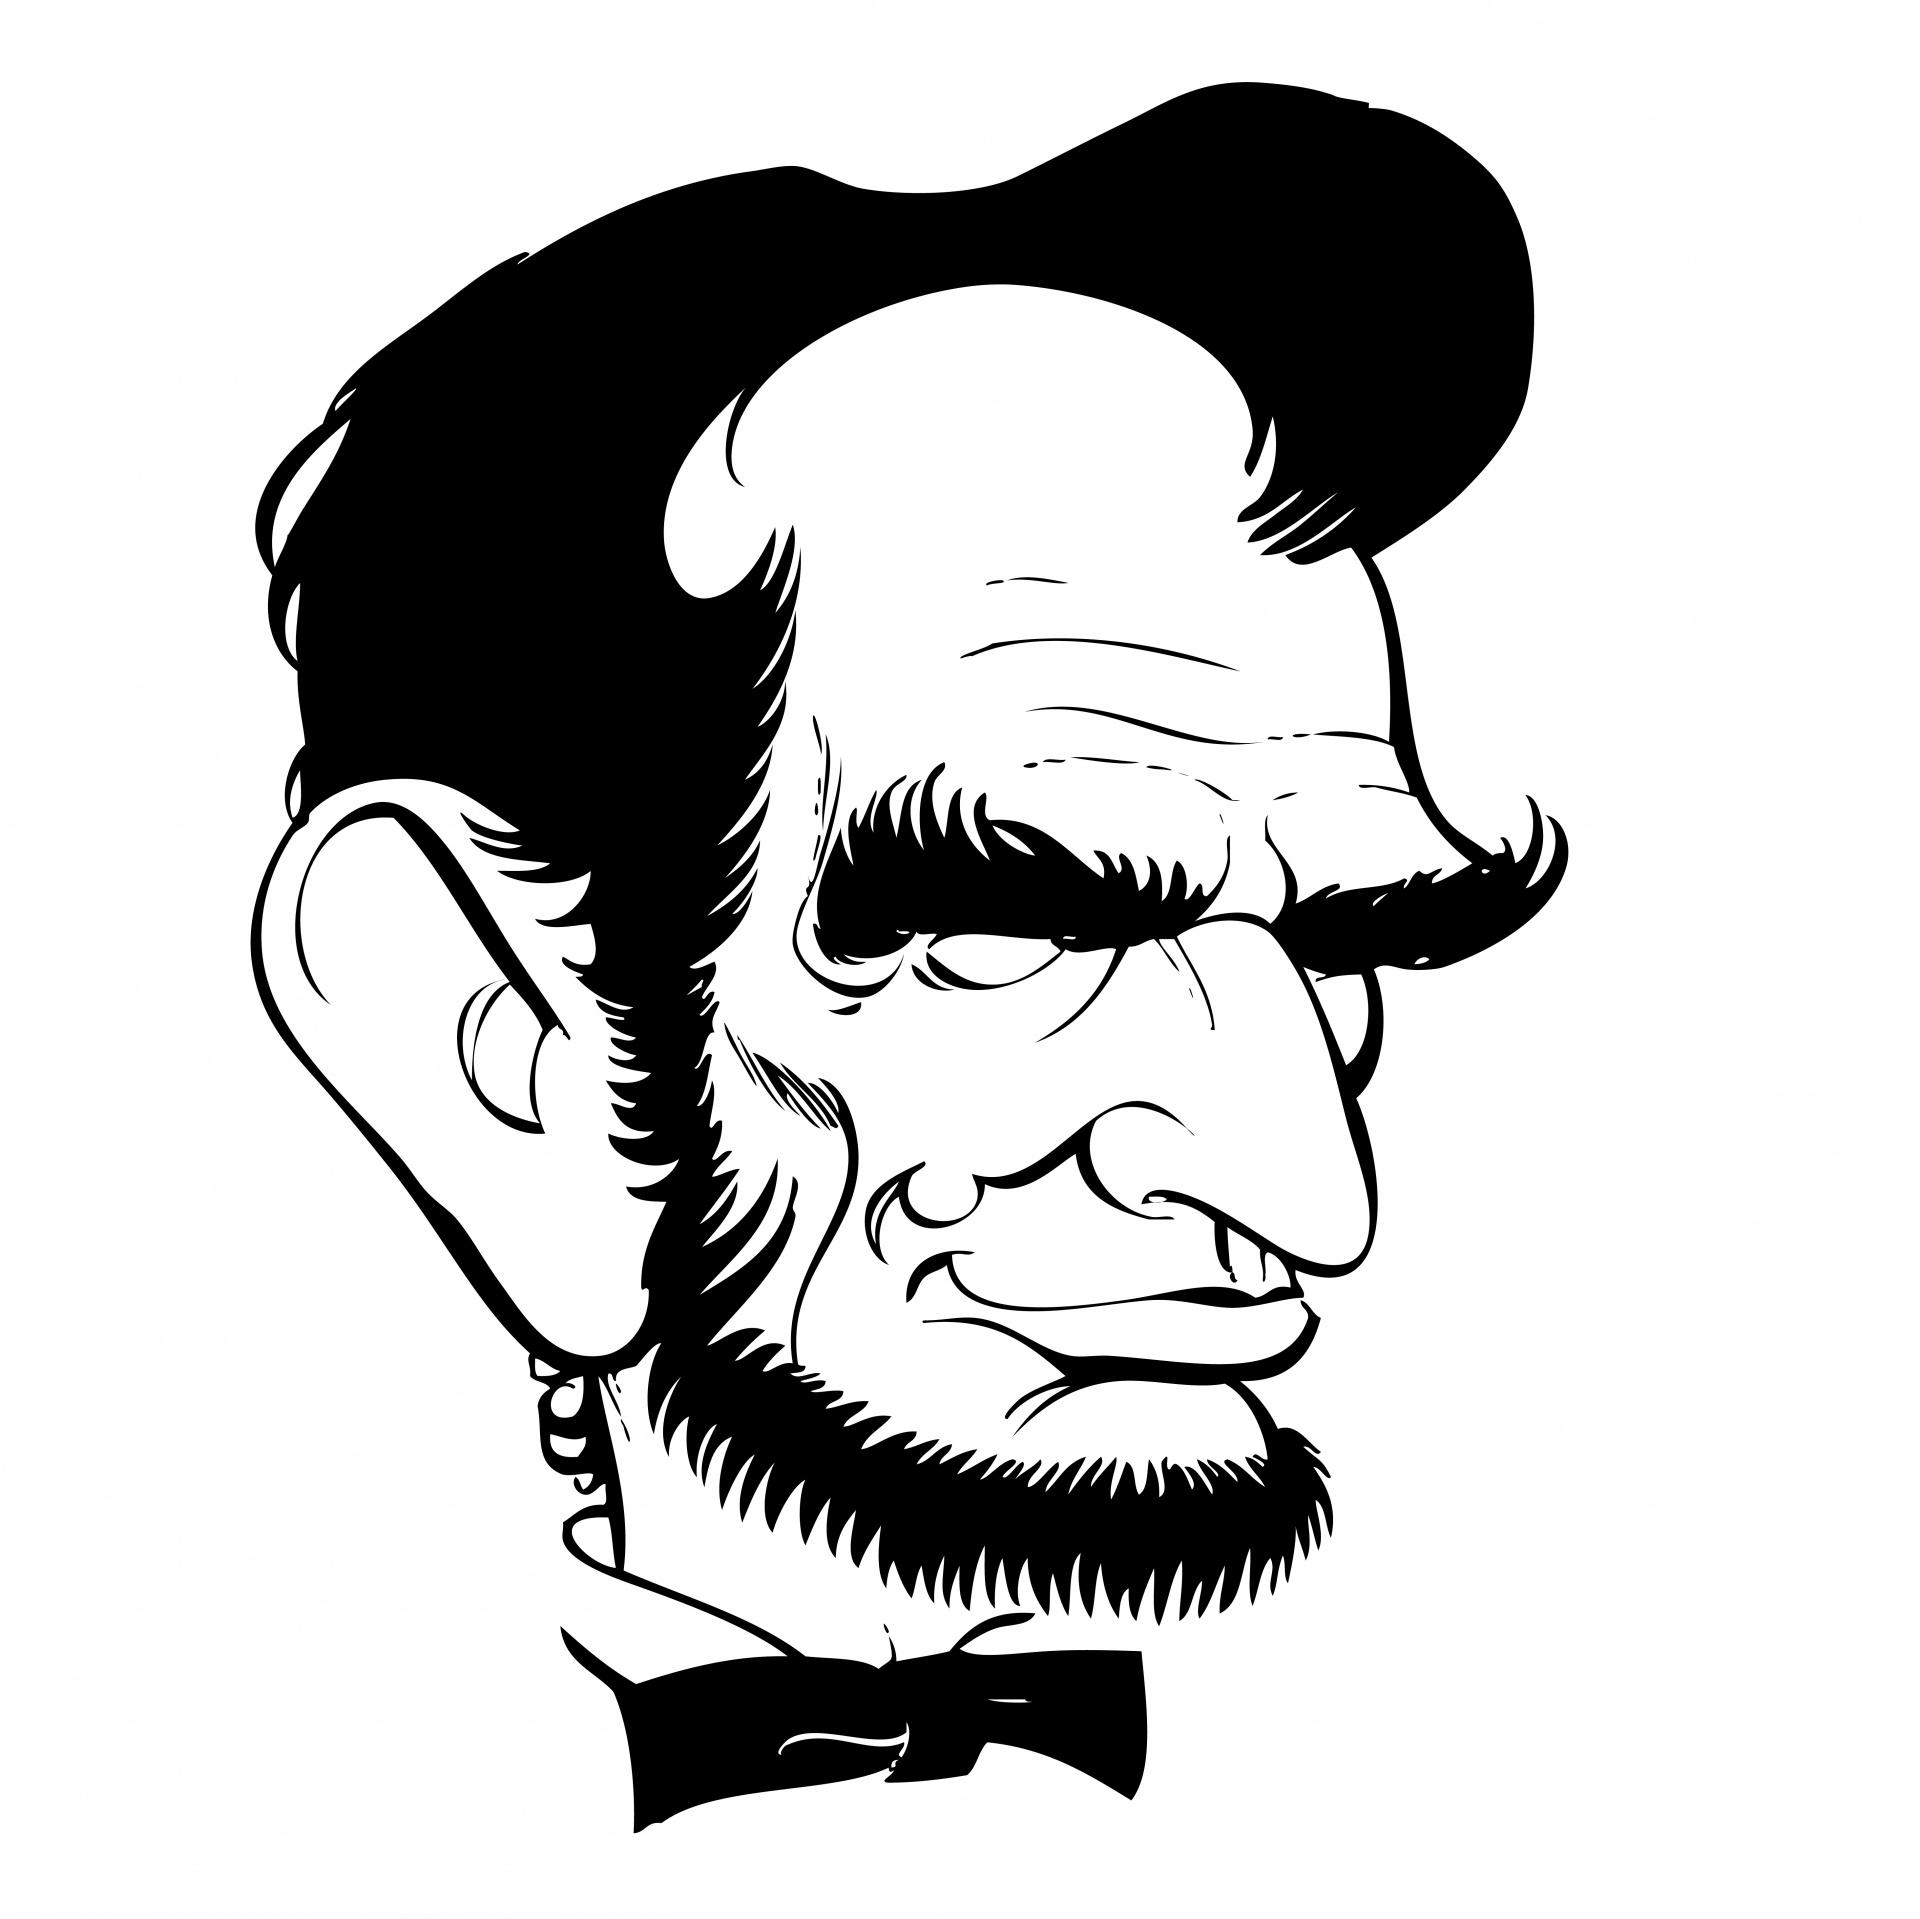 1920x1919 Abraham Lincoln, Caricature, Cartoon, Line Art, Drawing